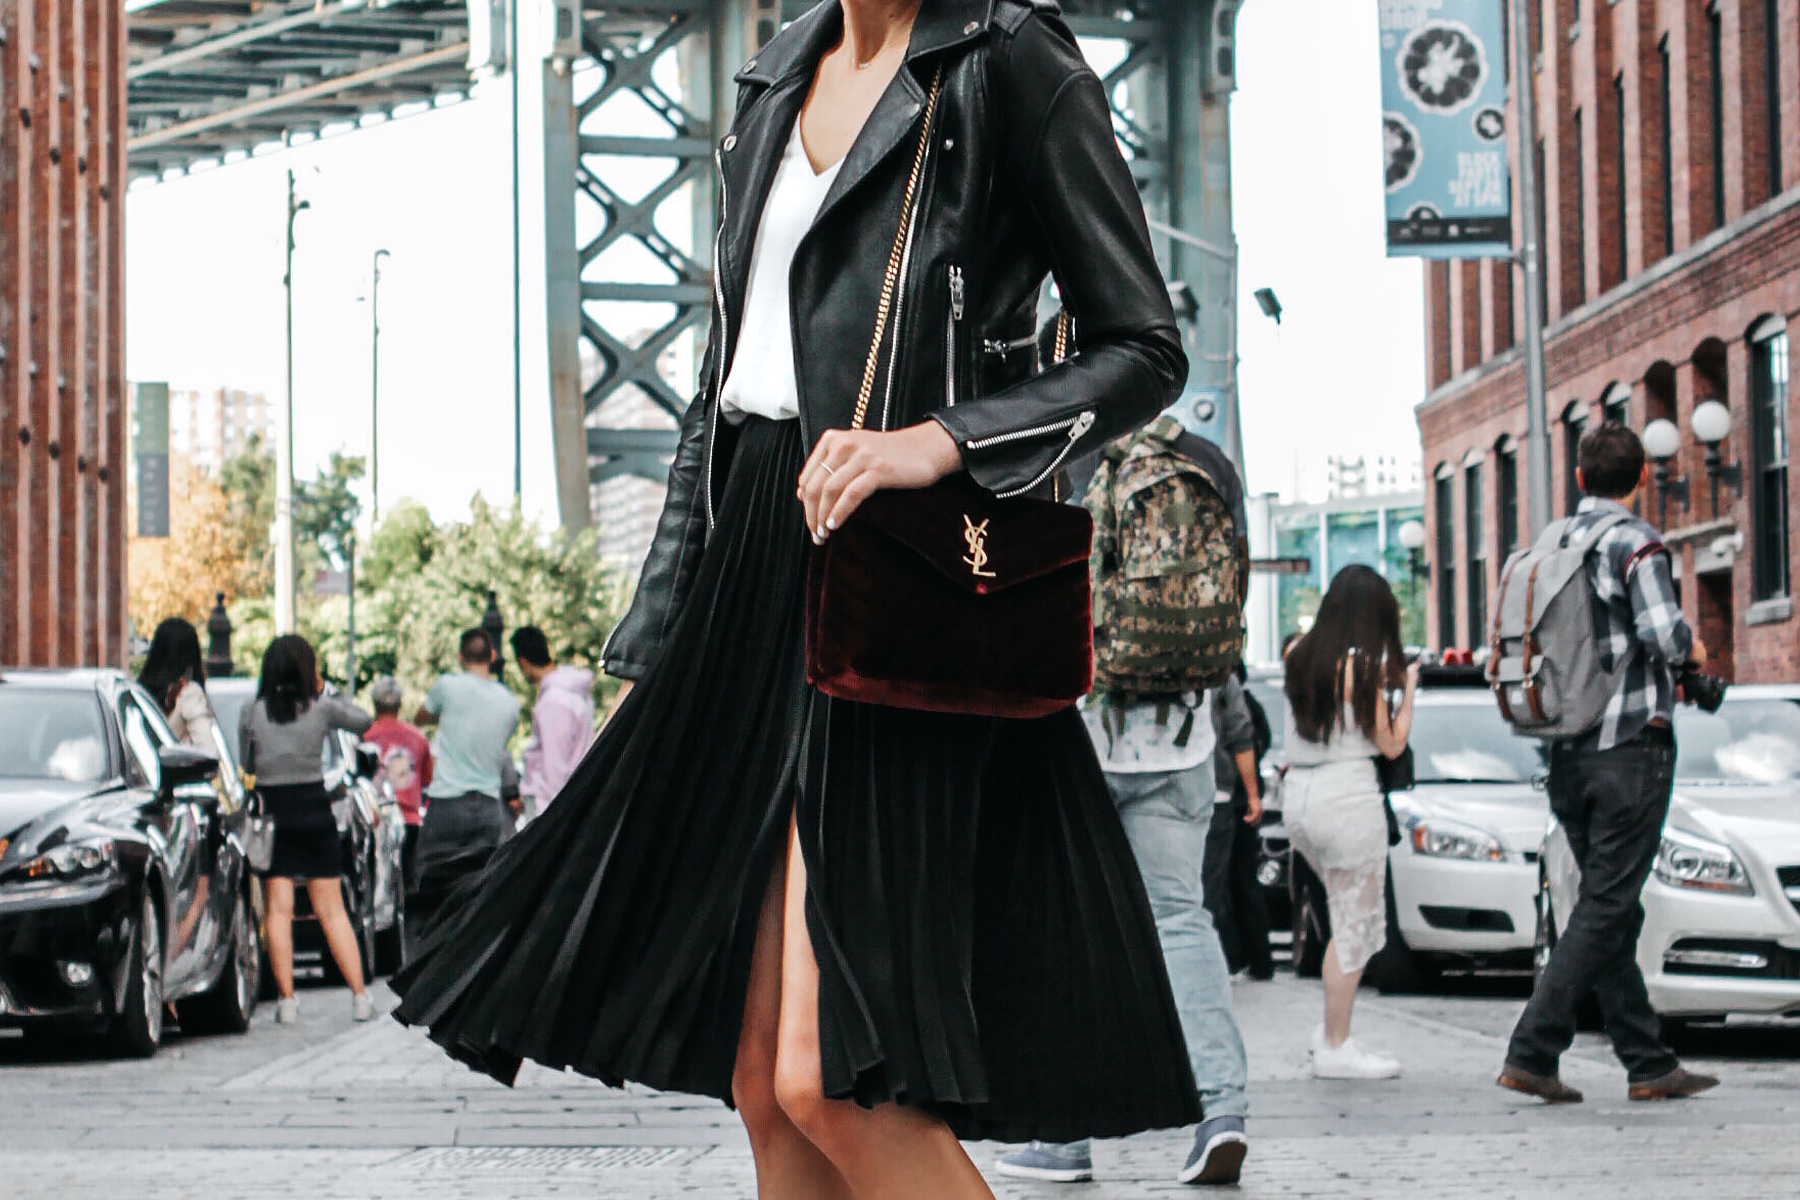 e06e77fc9d99 Black Leather Jacket Black Pleated Midi Skirt Saint Laurent Burgundy Velvet  Bag Fashion Jackson Dallas Blogger